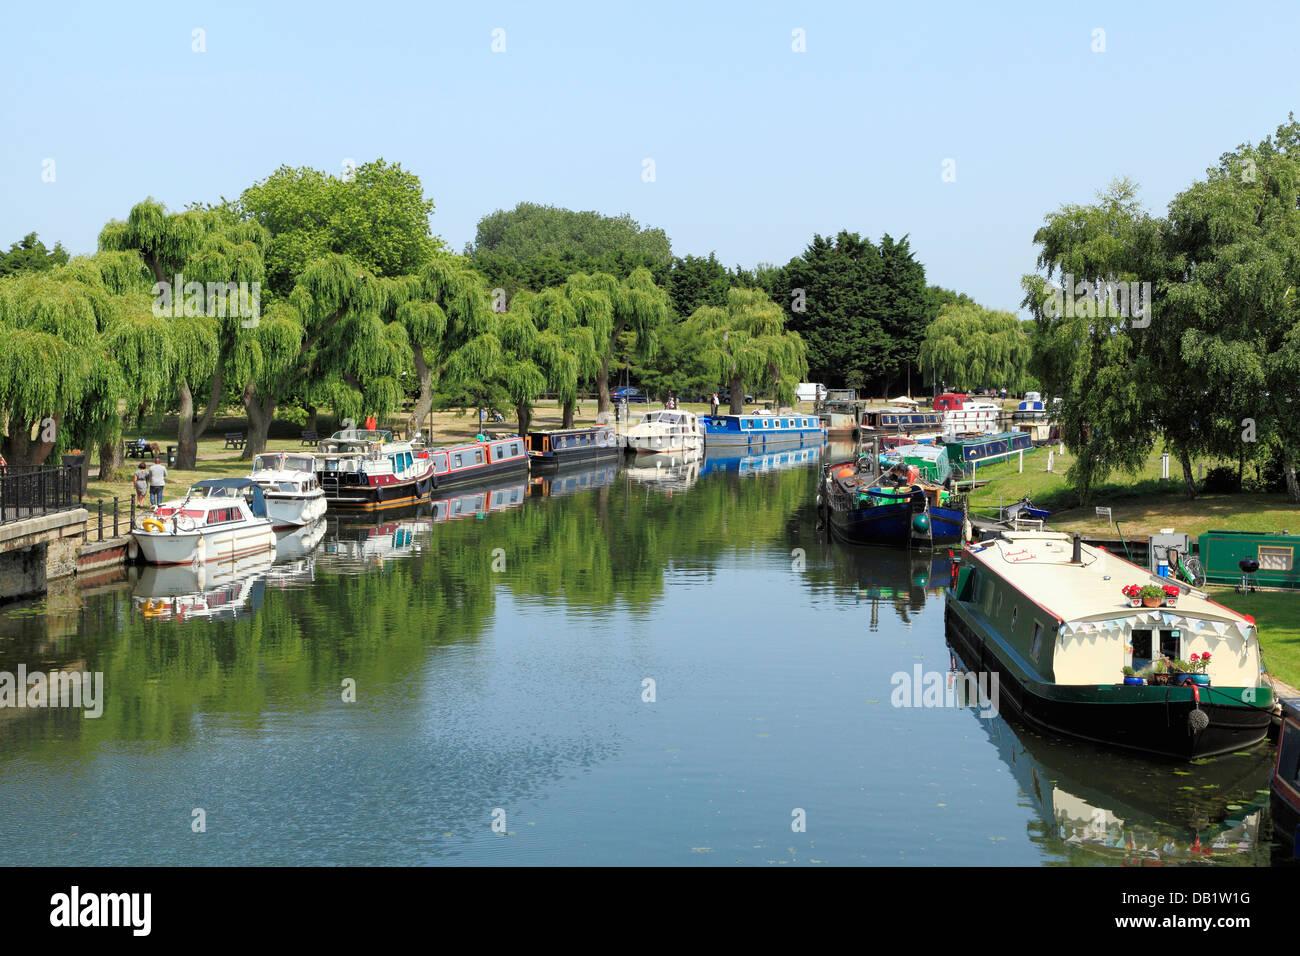 Ely, río Ouse, barcazas y lanchas, ríos ingleses posadas pubs pub Cambridgeshire, Inglaterra Imagen De Stock